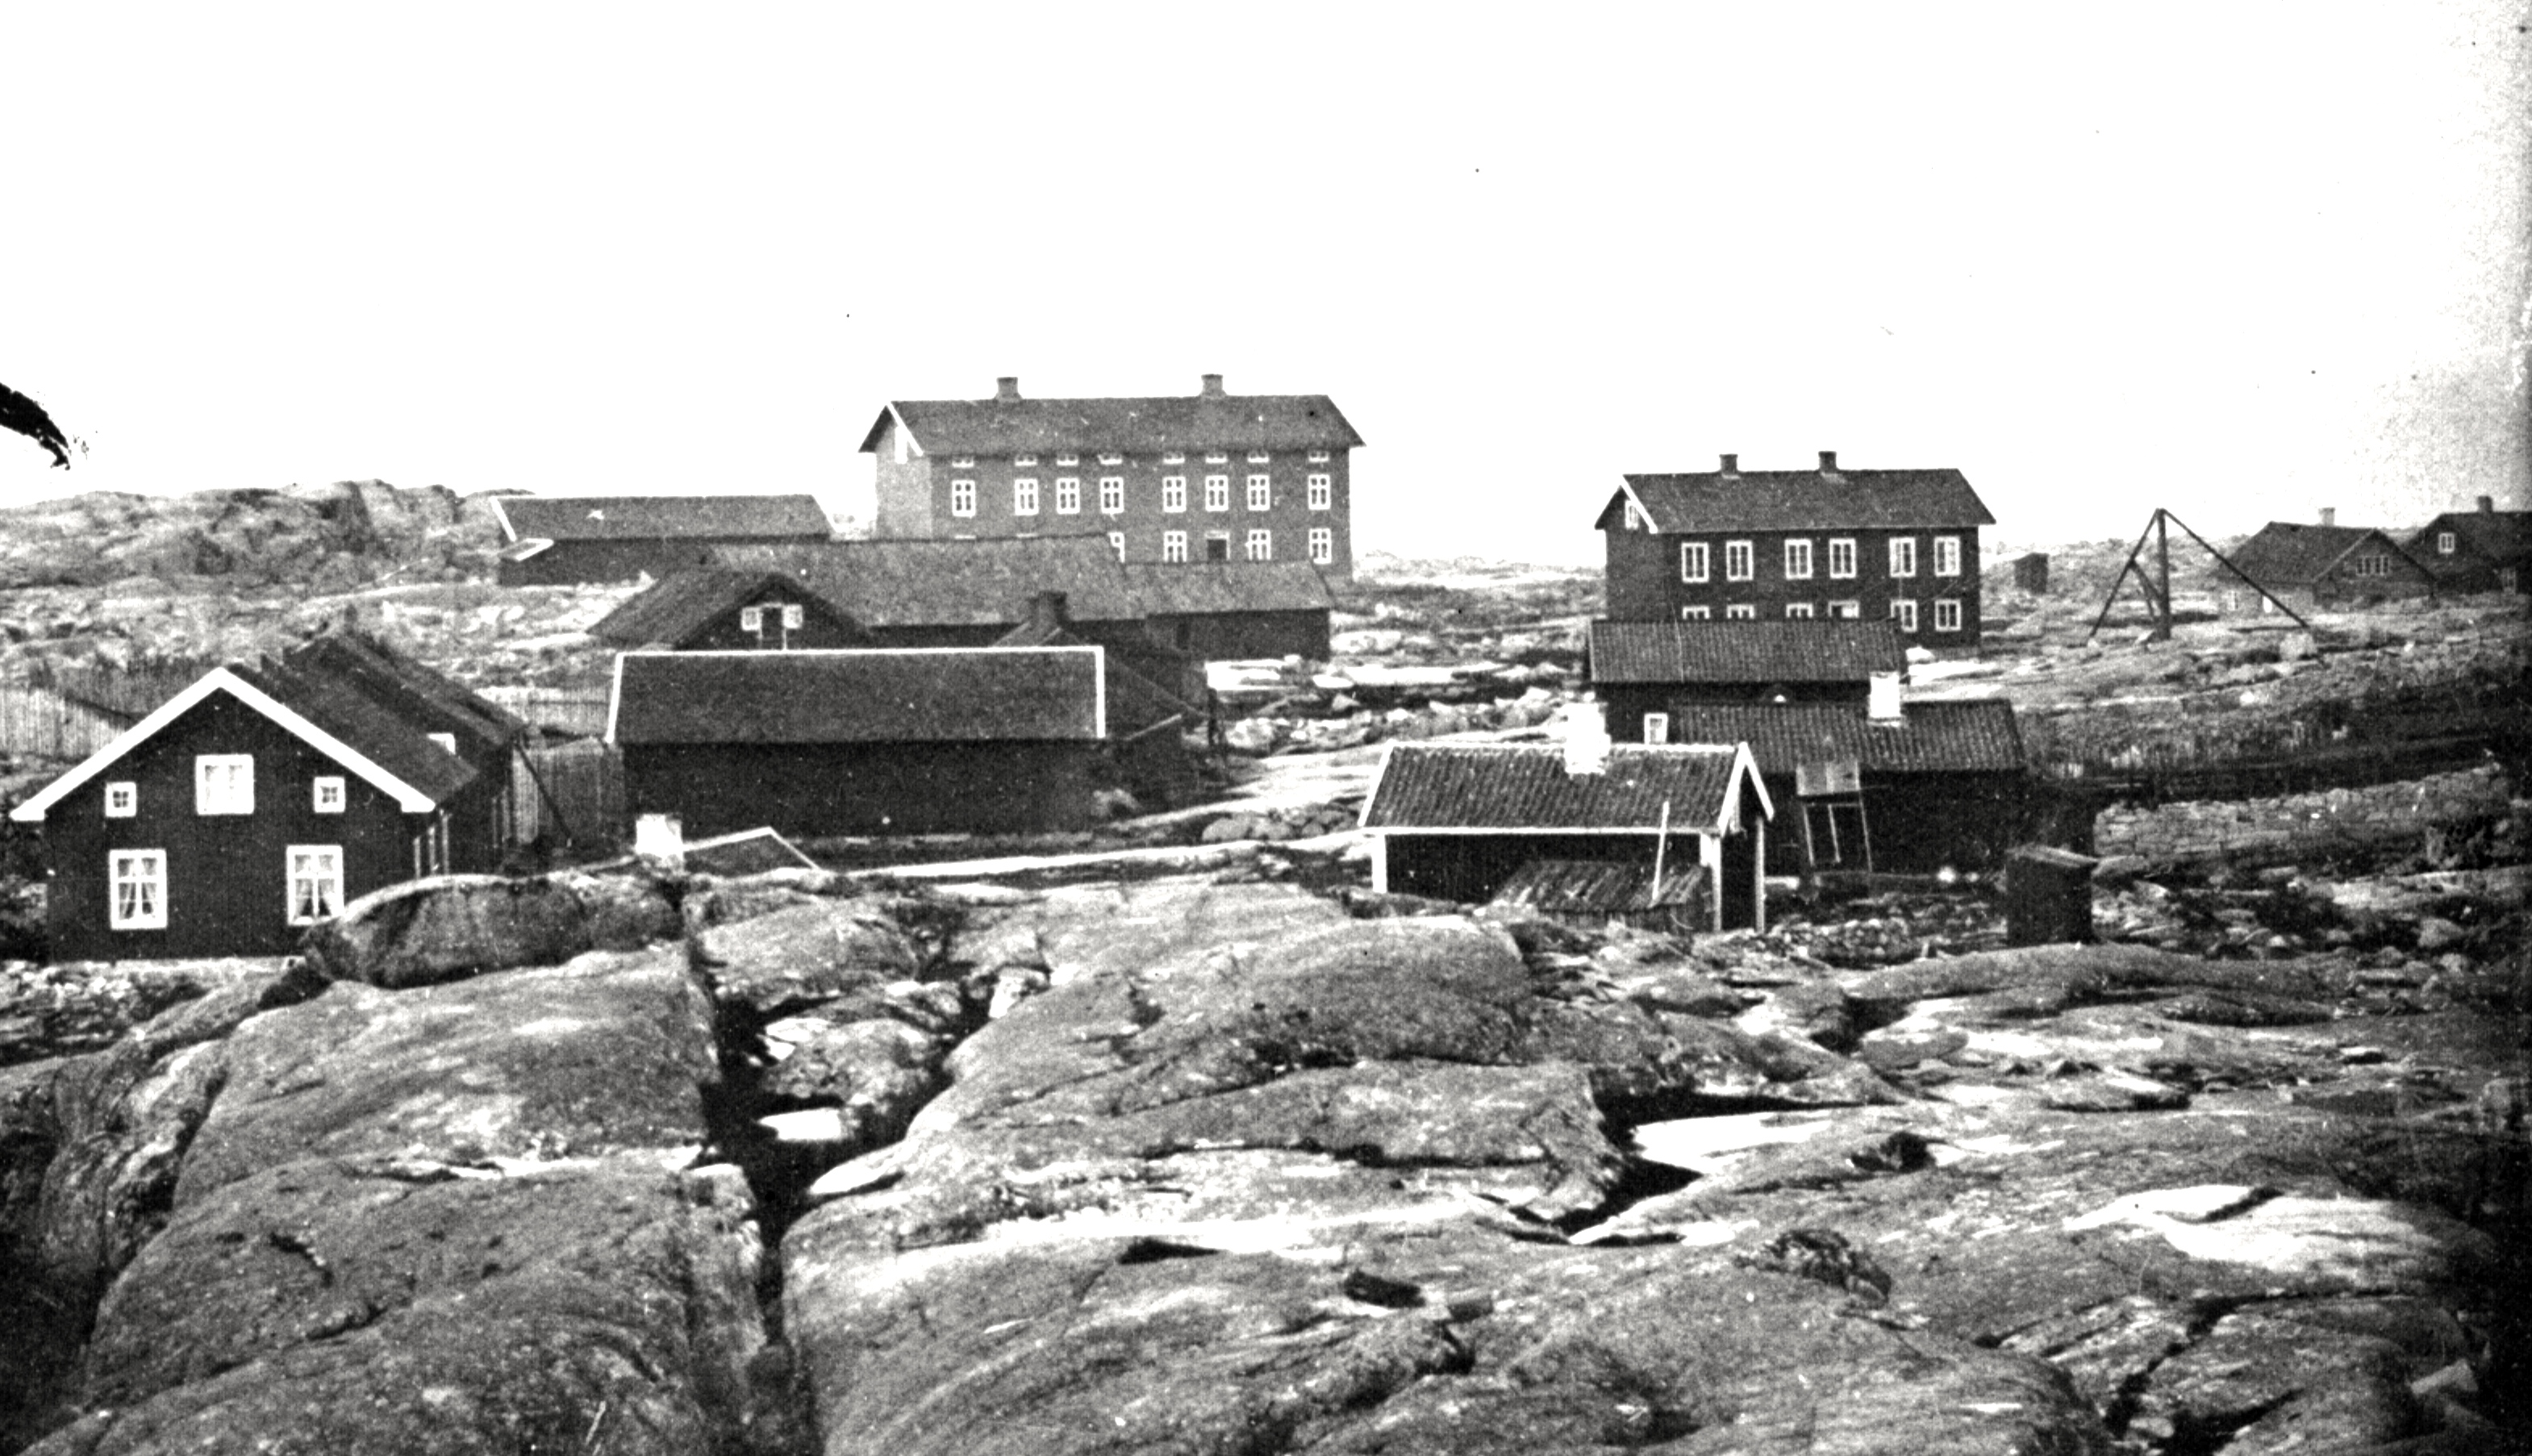 Draget 1875 - Panorama med Hus 15 i bakgrunden.